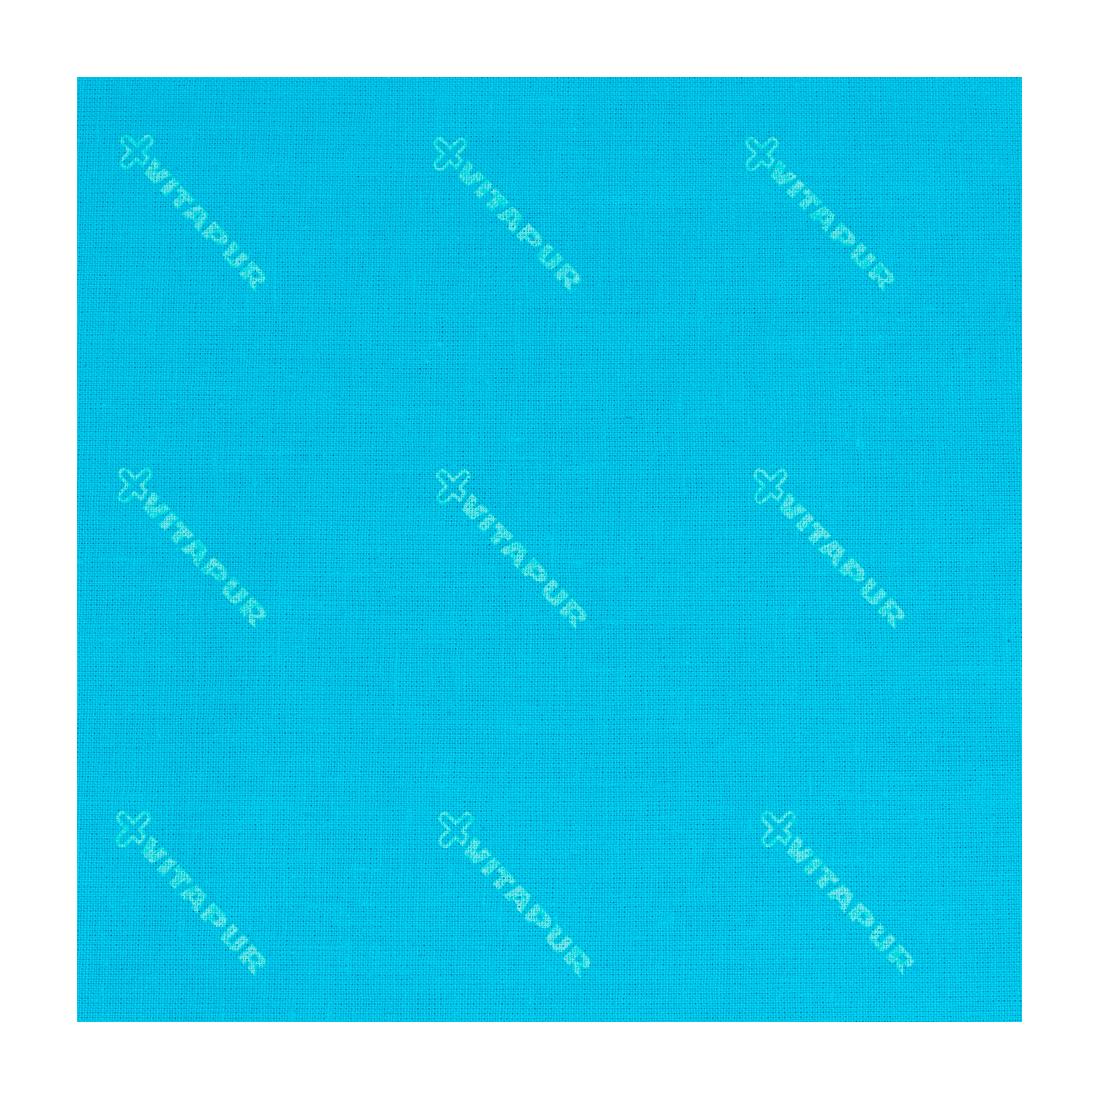 NP BA Podkova PROFI mEPS 200x37 modrý, tyrkys